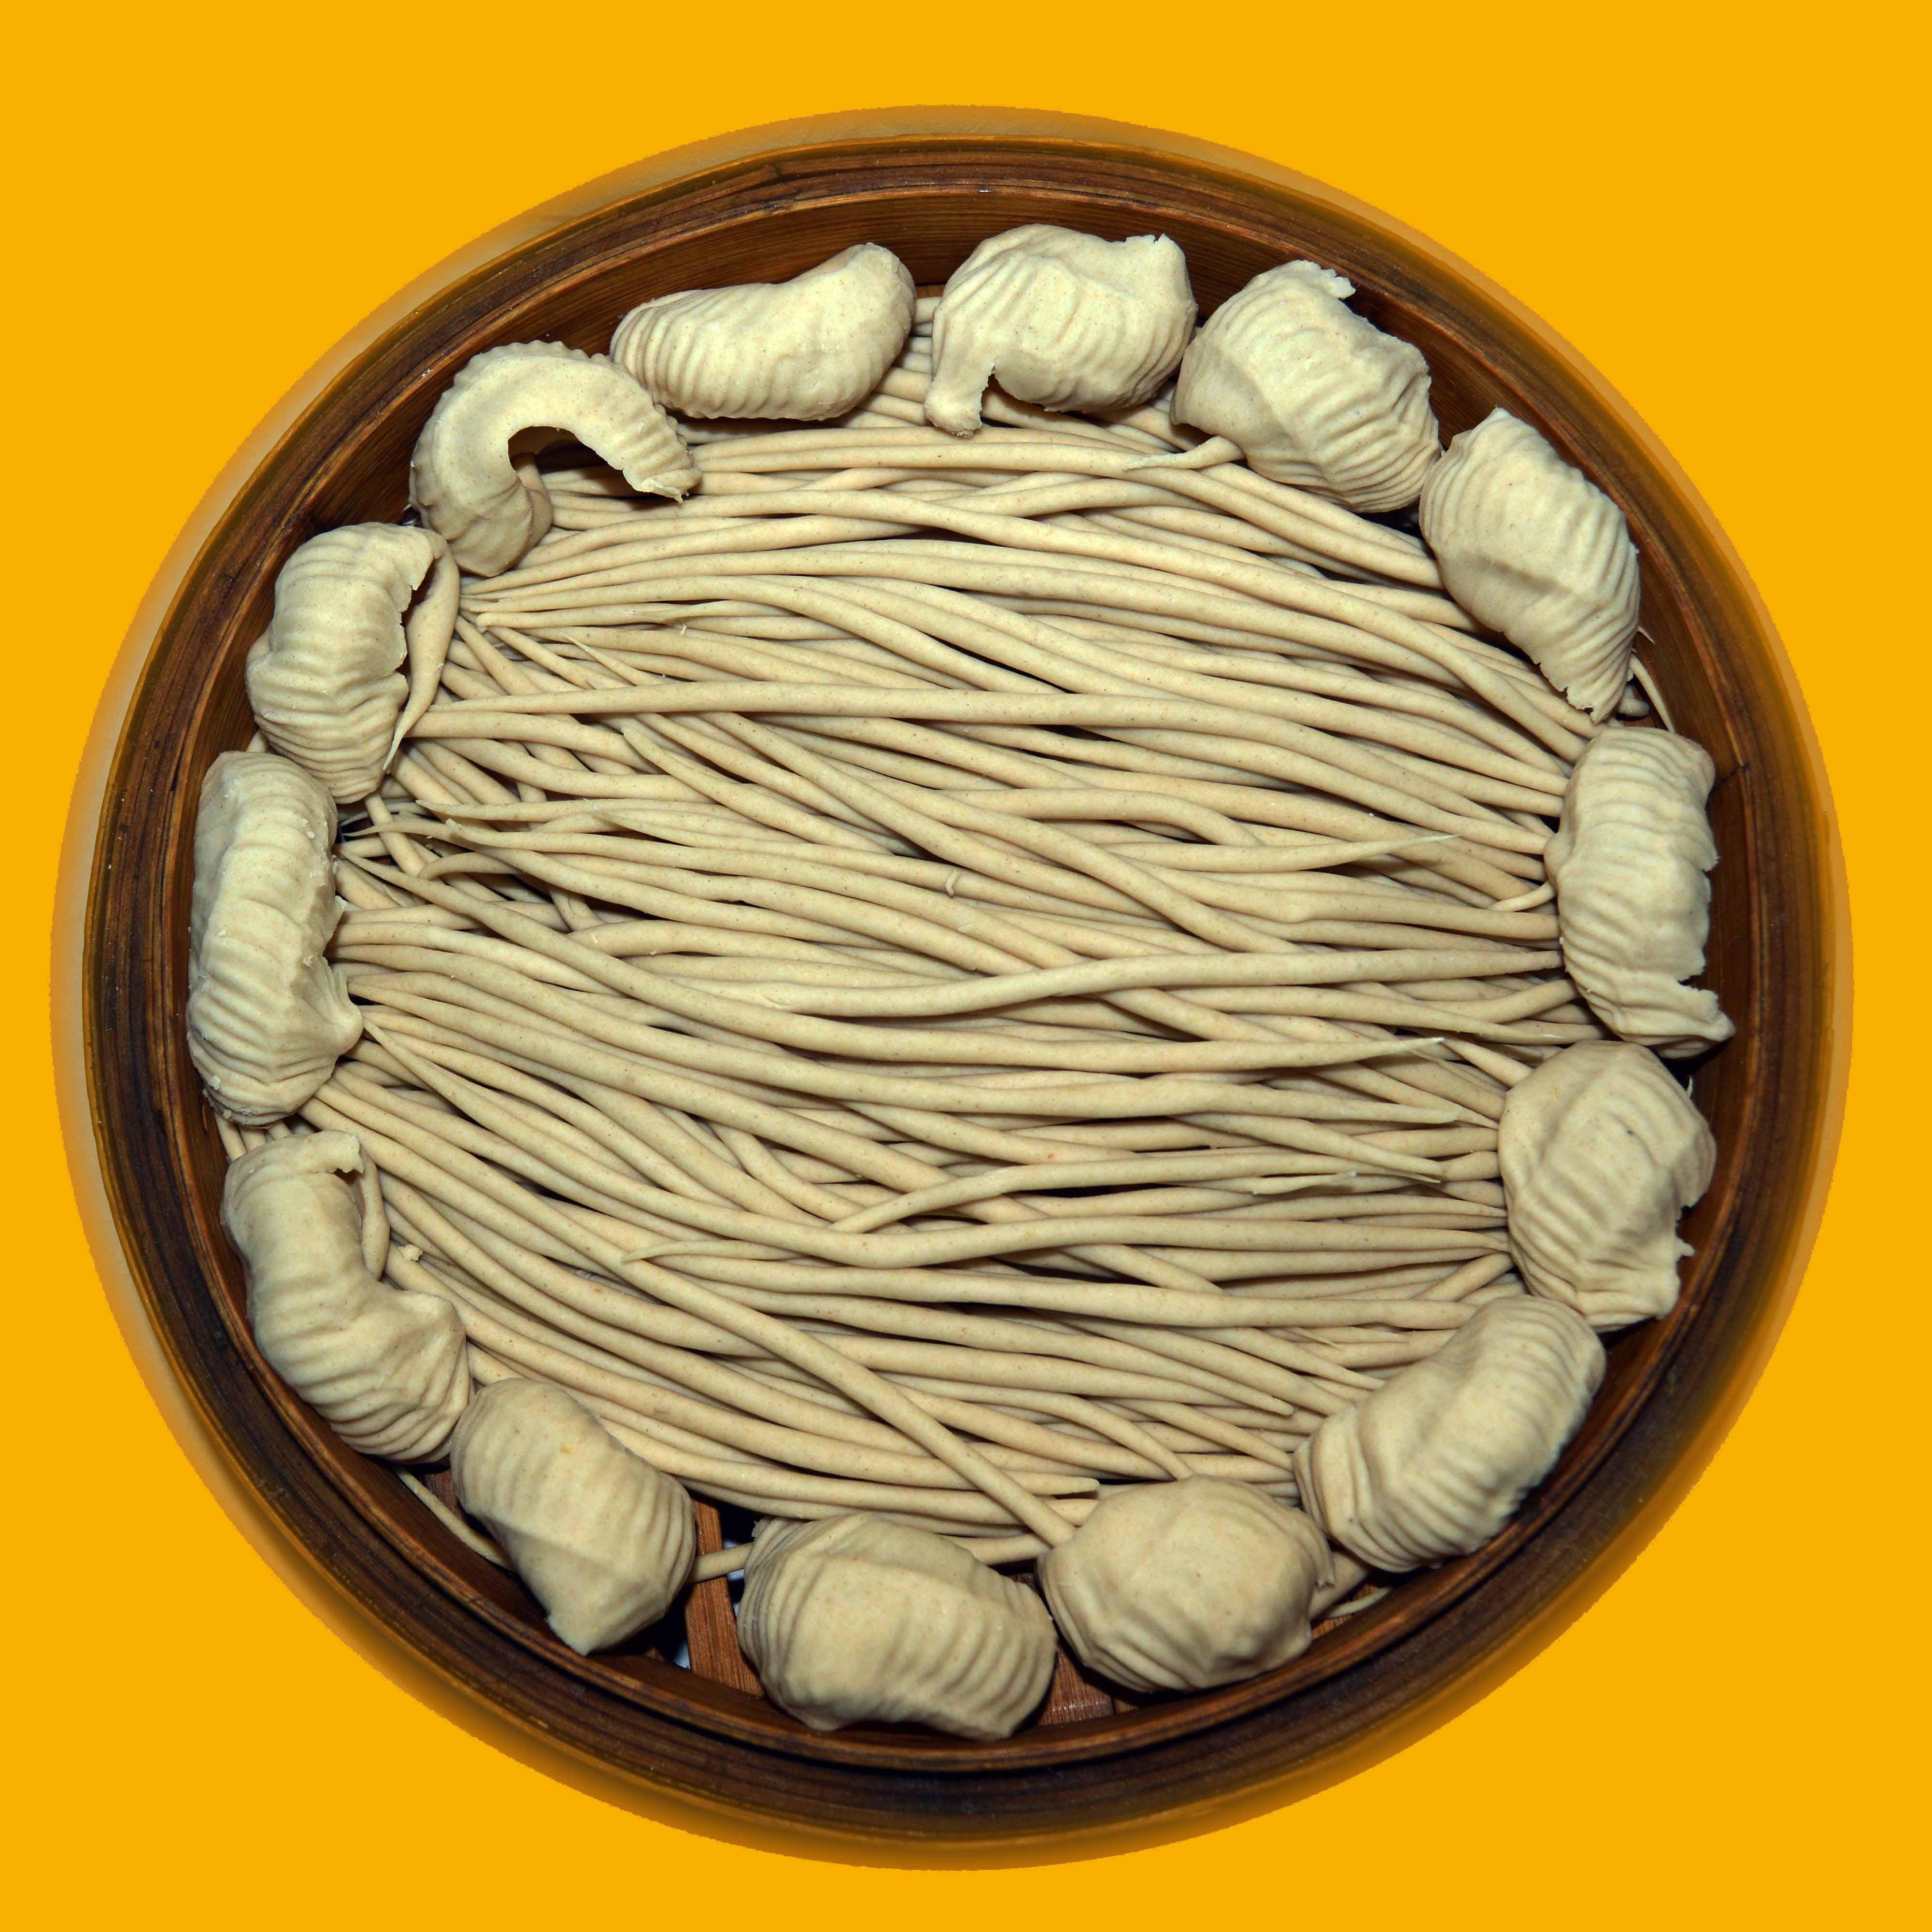 Shanxi farmhouse specialty Lanxian pure naked oats flour coarse grain stone flour 5 kg package